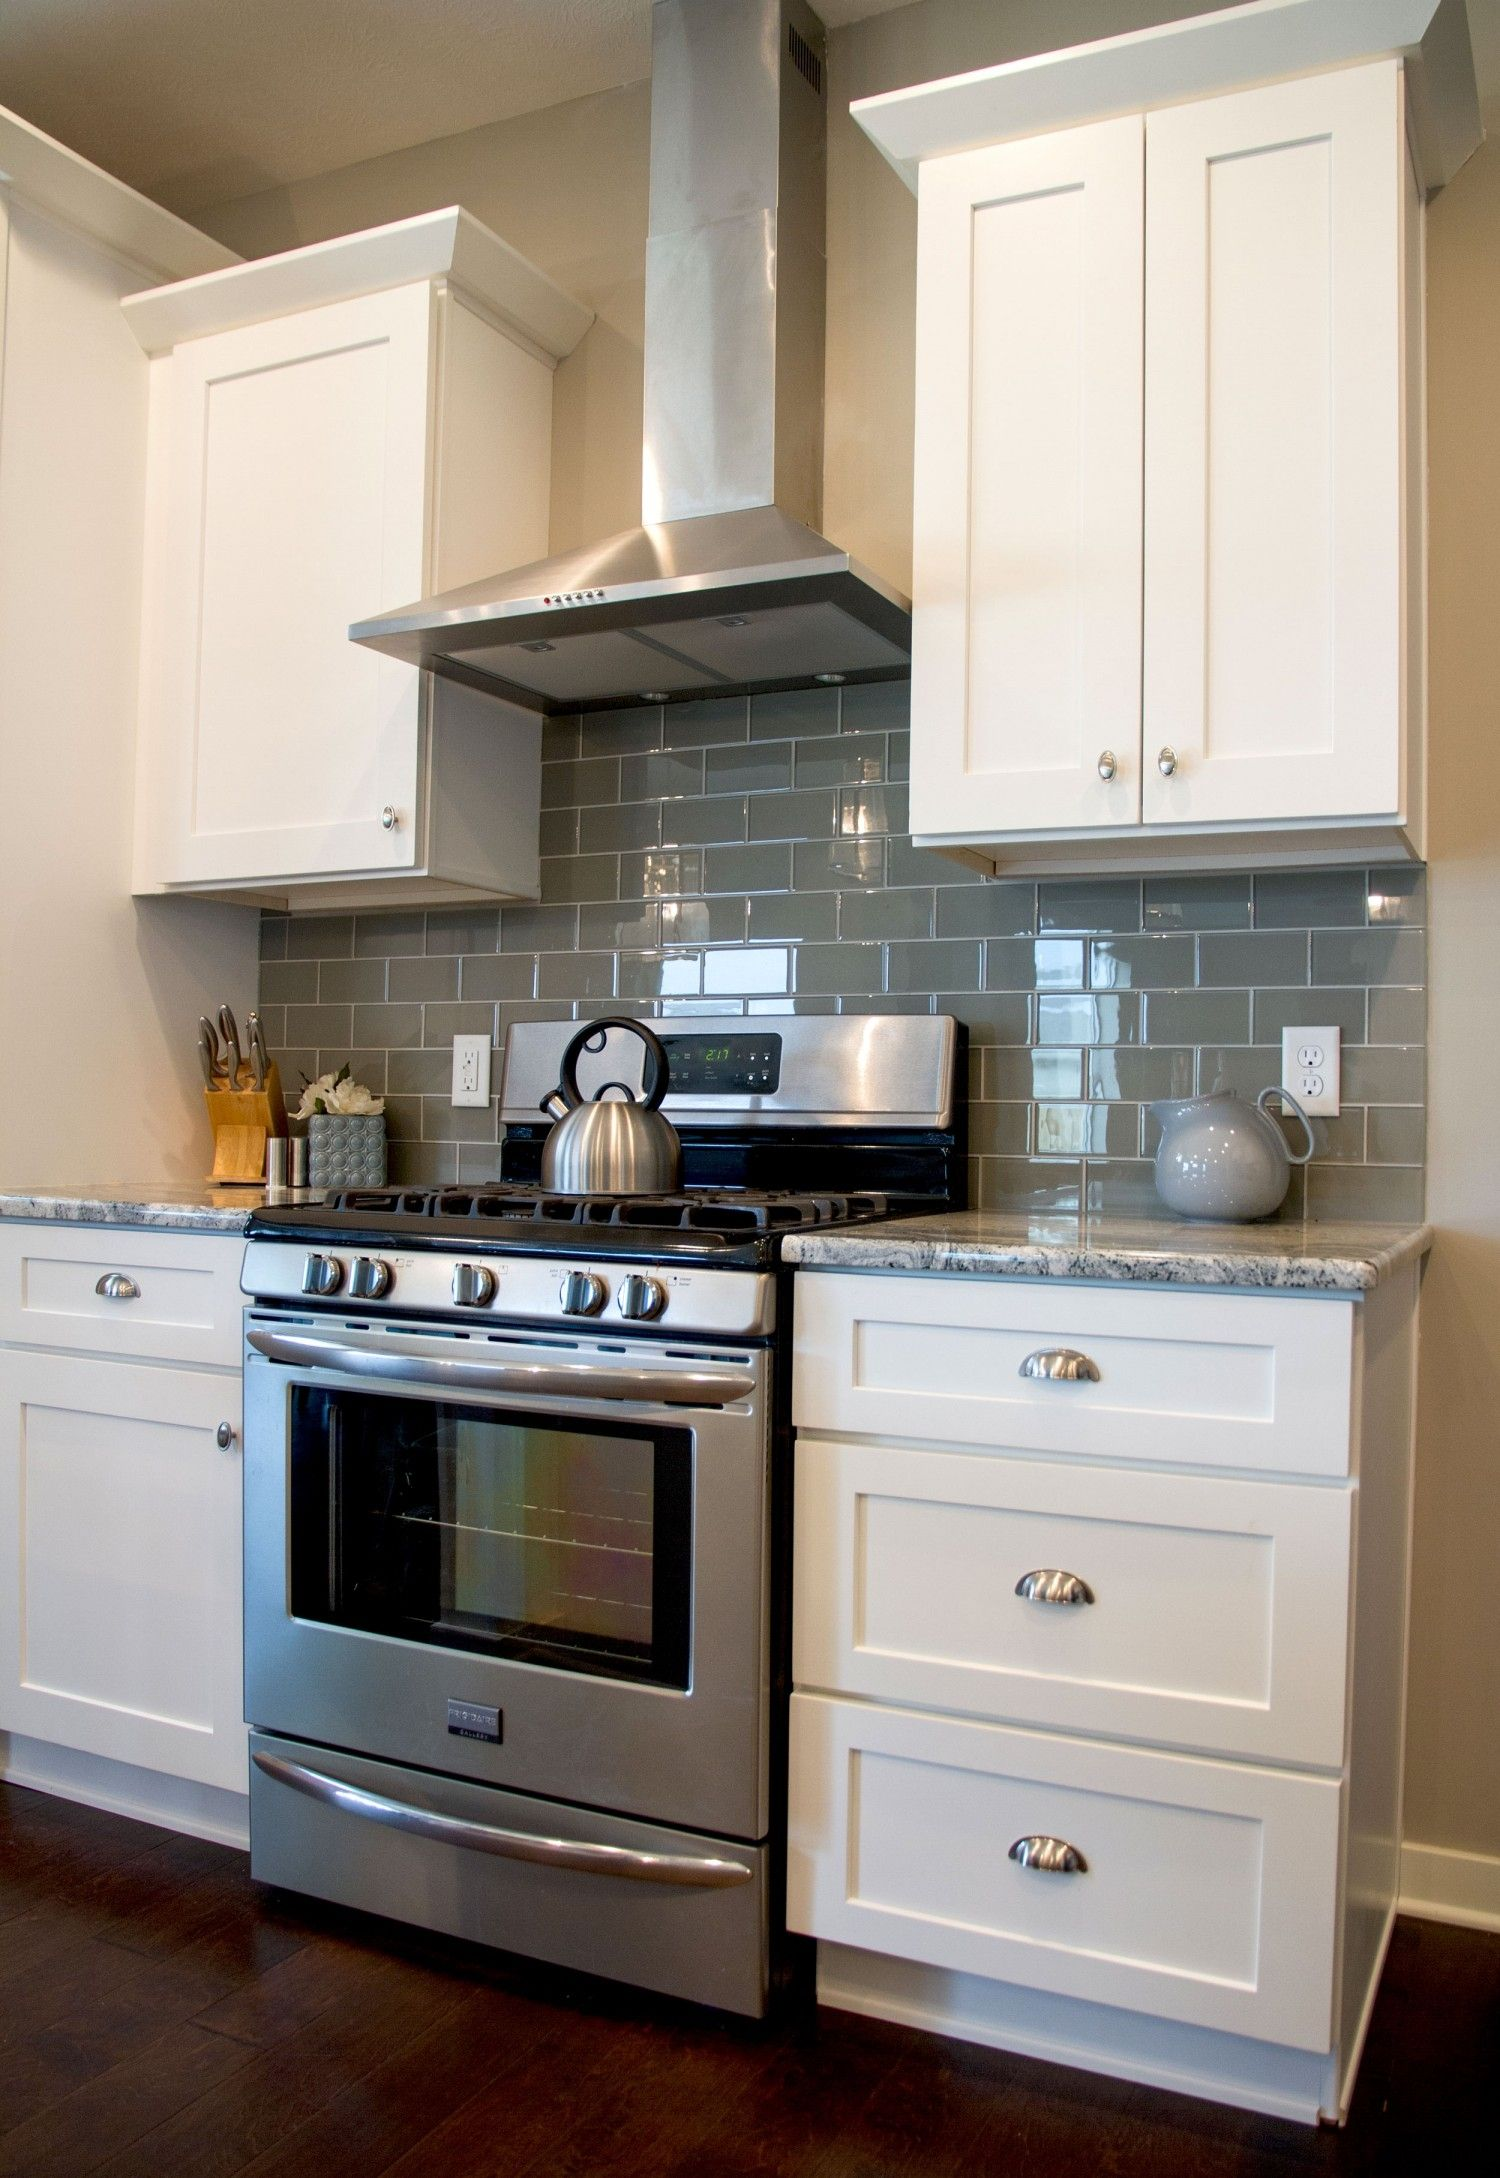 24 Inch Height Kitchen Cabinets Kitchen Wall Cabinets Kitchen Cabinets White Shaker Kitchen